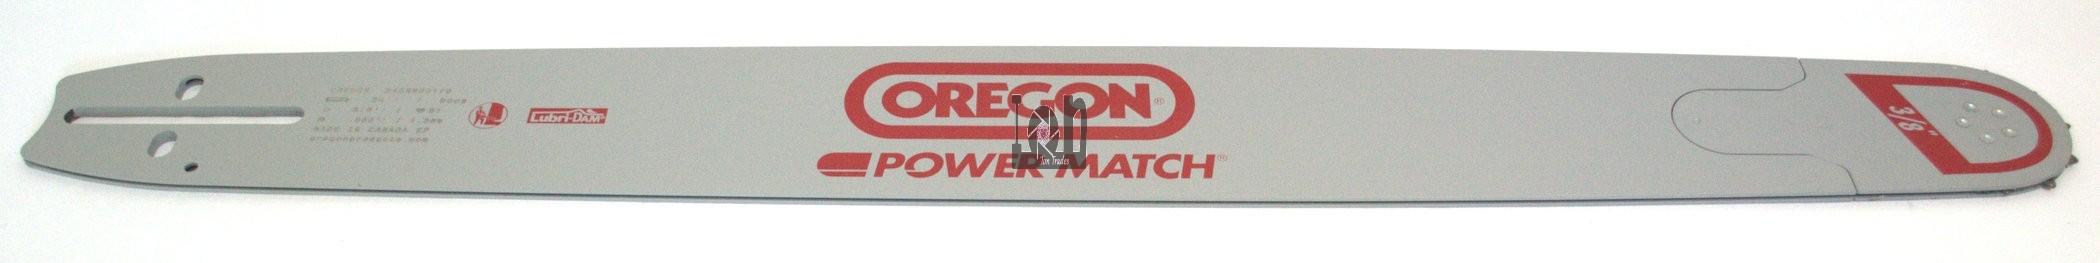 "Oregon Power Match 24"" Chainsaw Guide Bar 240RNDD176  .050"" 3/8""LP 81DL"